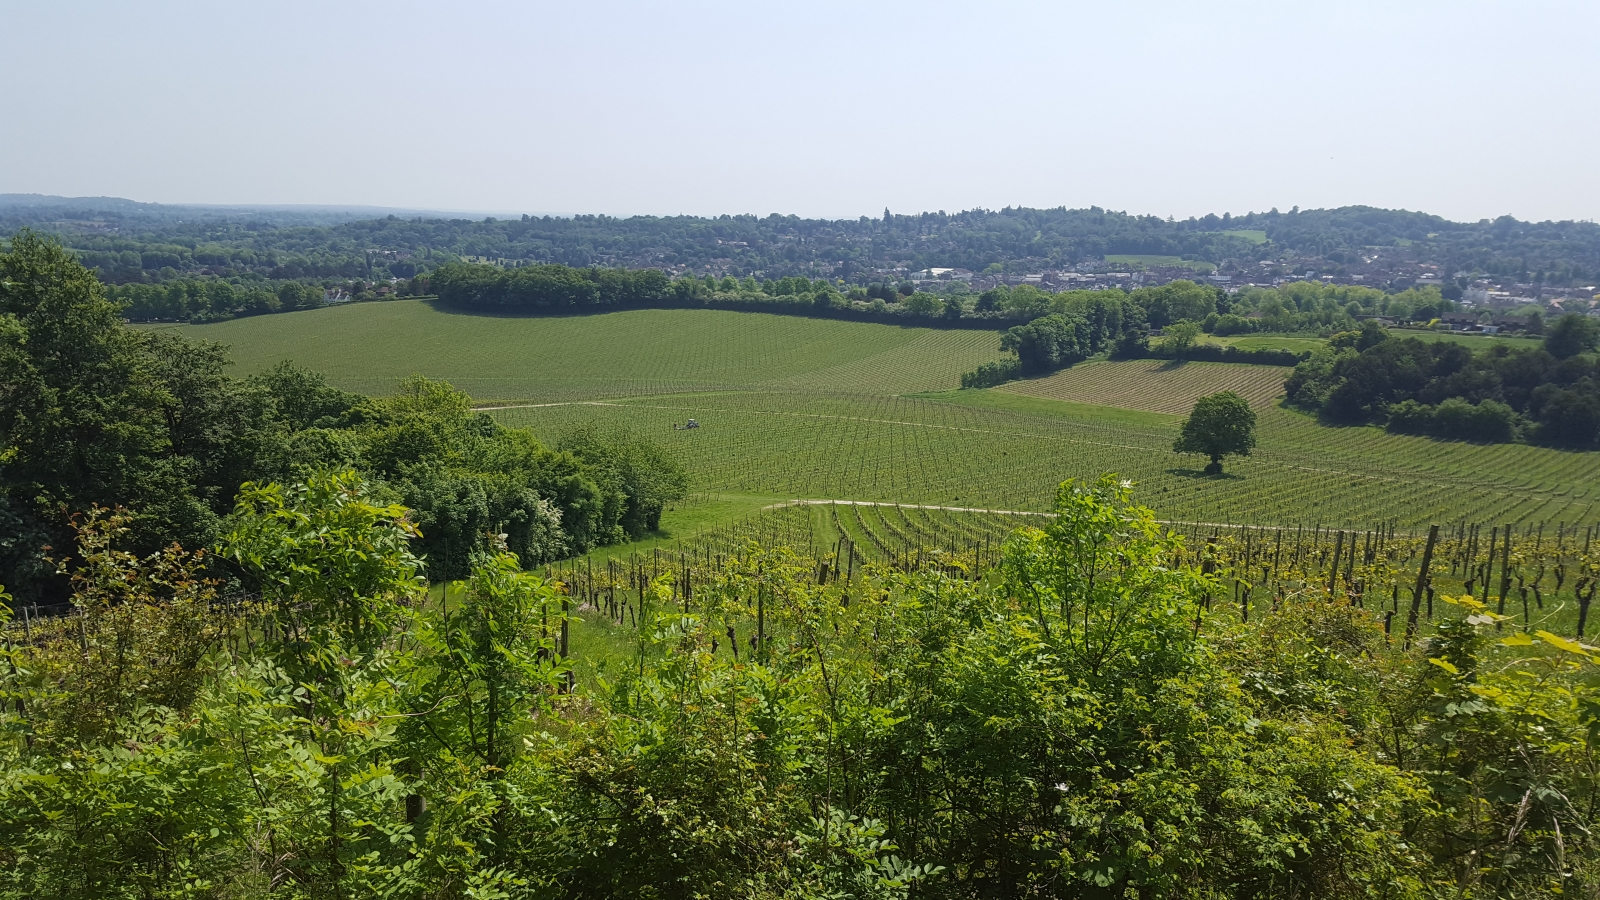 Dennbies vineyard